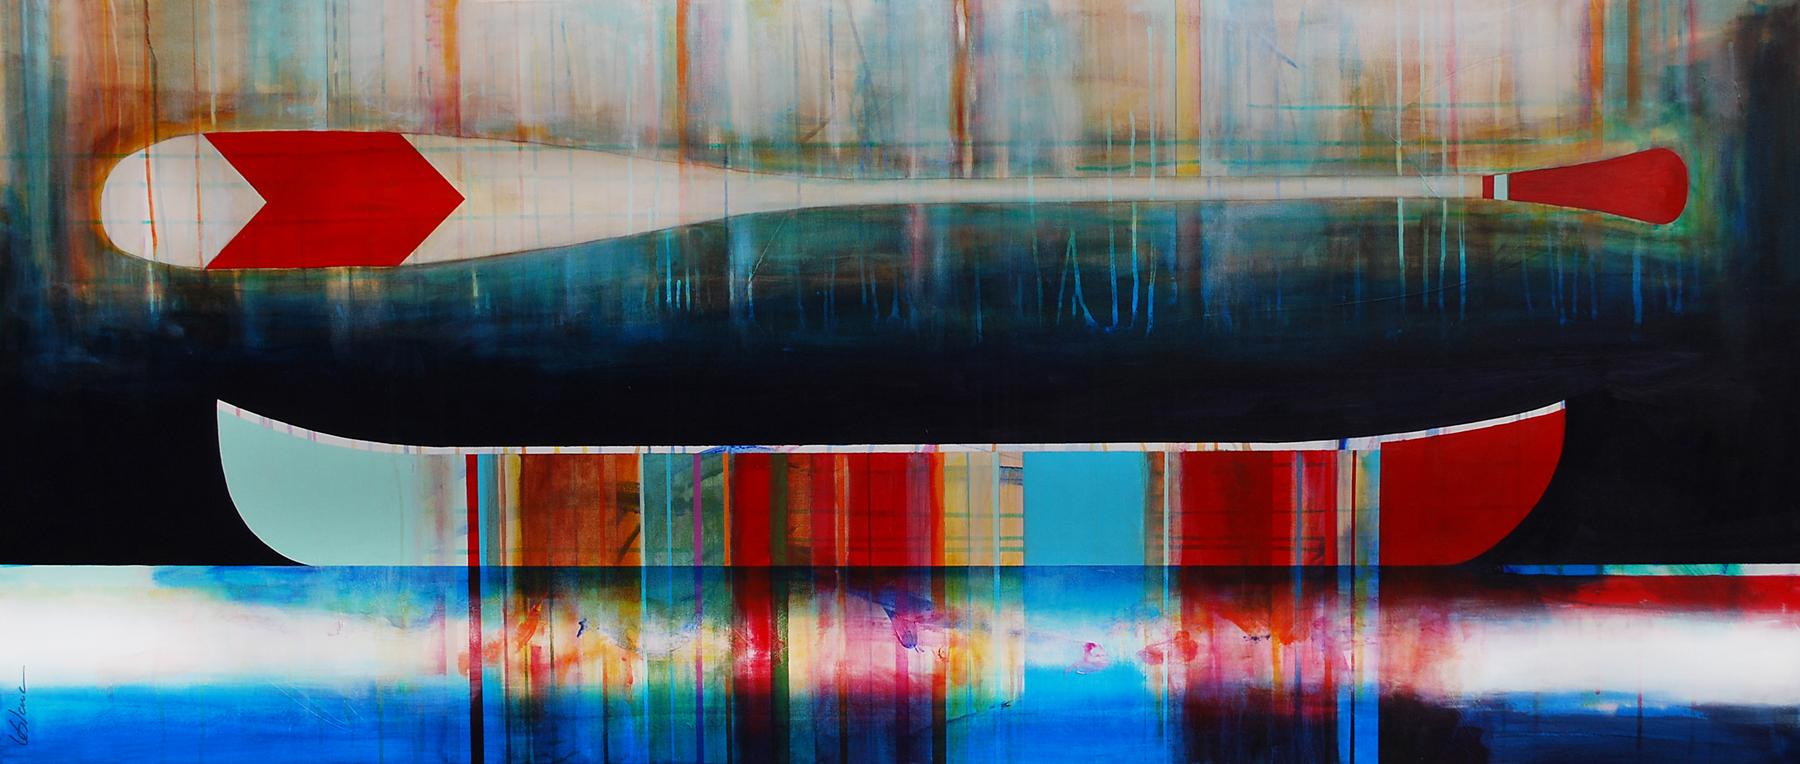 Jamais dire jamais, mixed media canoe painting by Sylvain Leblanc | Effusion Art Gallery + Cast Glass Studio, Invermere BC